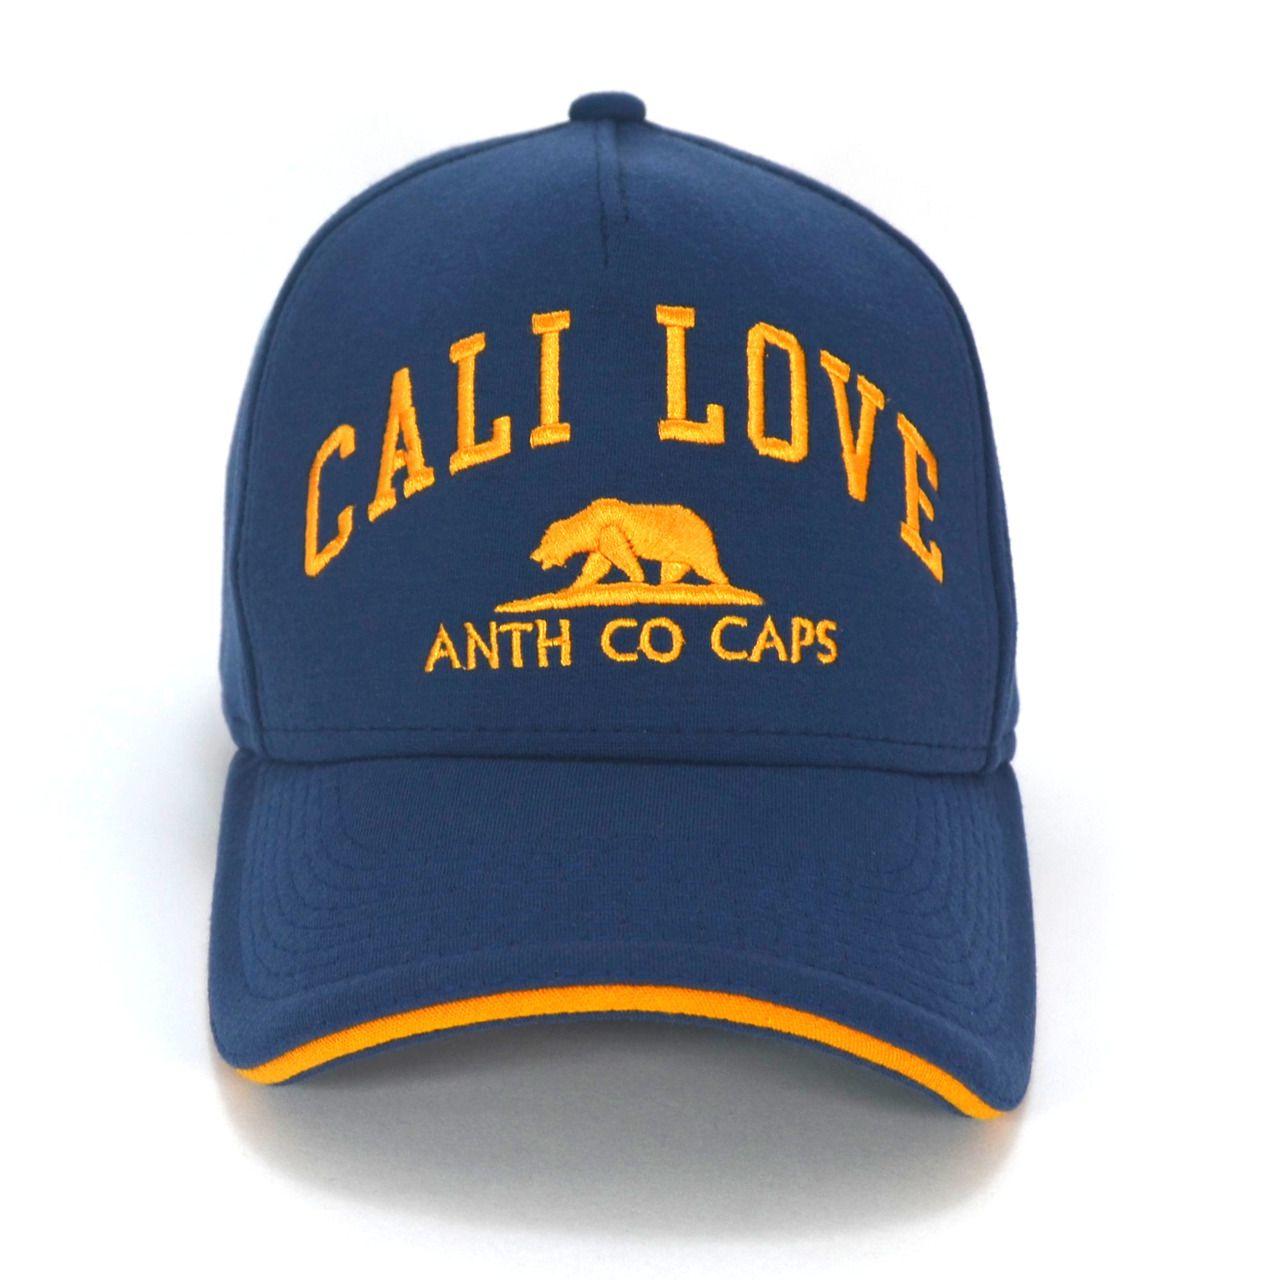 Boné California Masculino Feminino Anth Co Cali Love Urso Azul e Amarelo